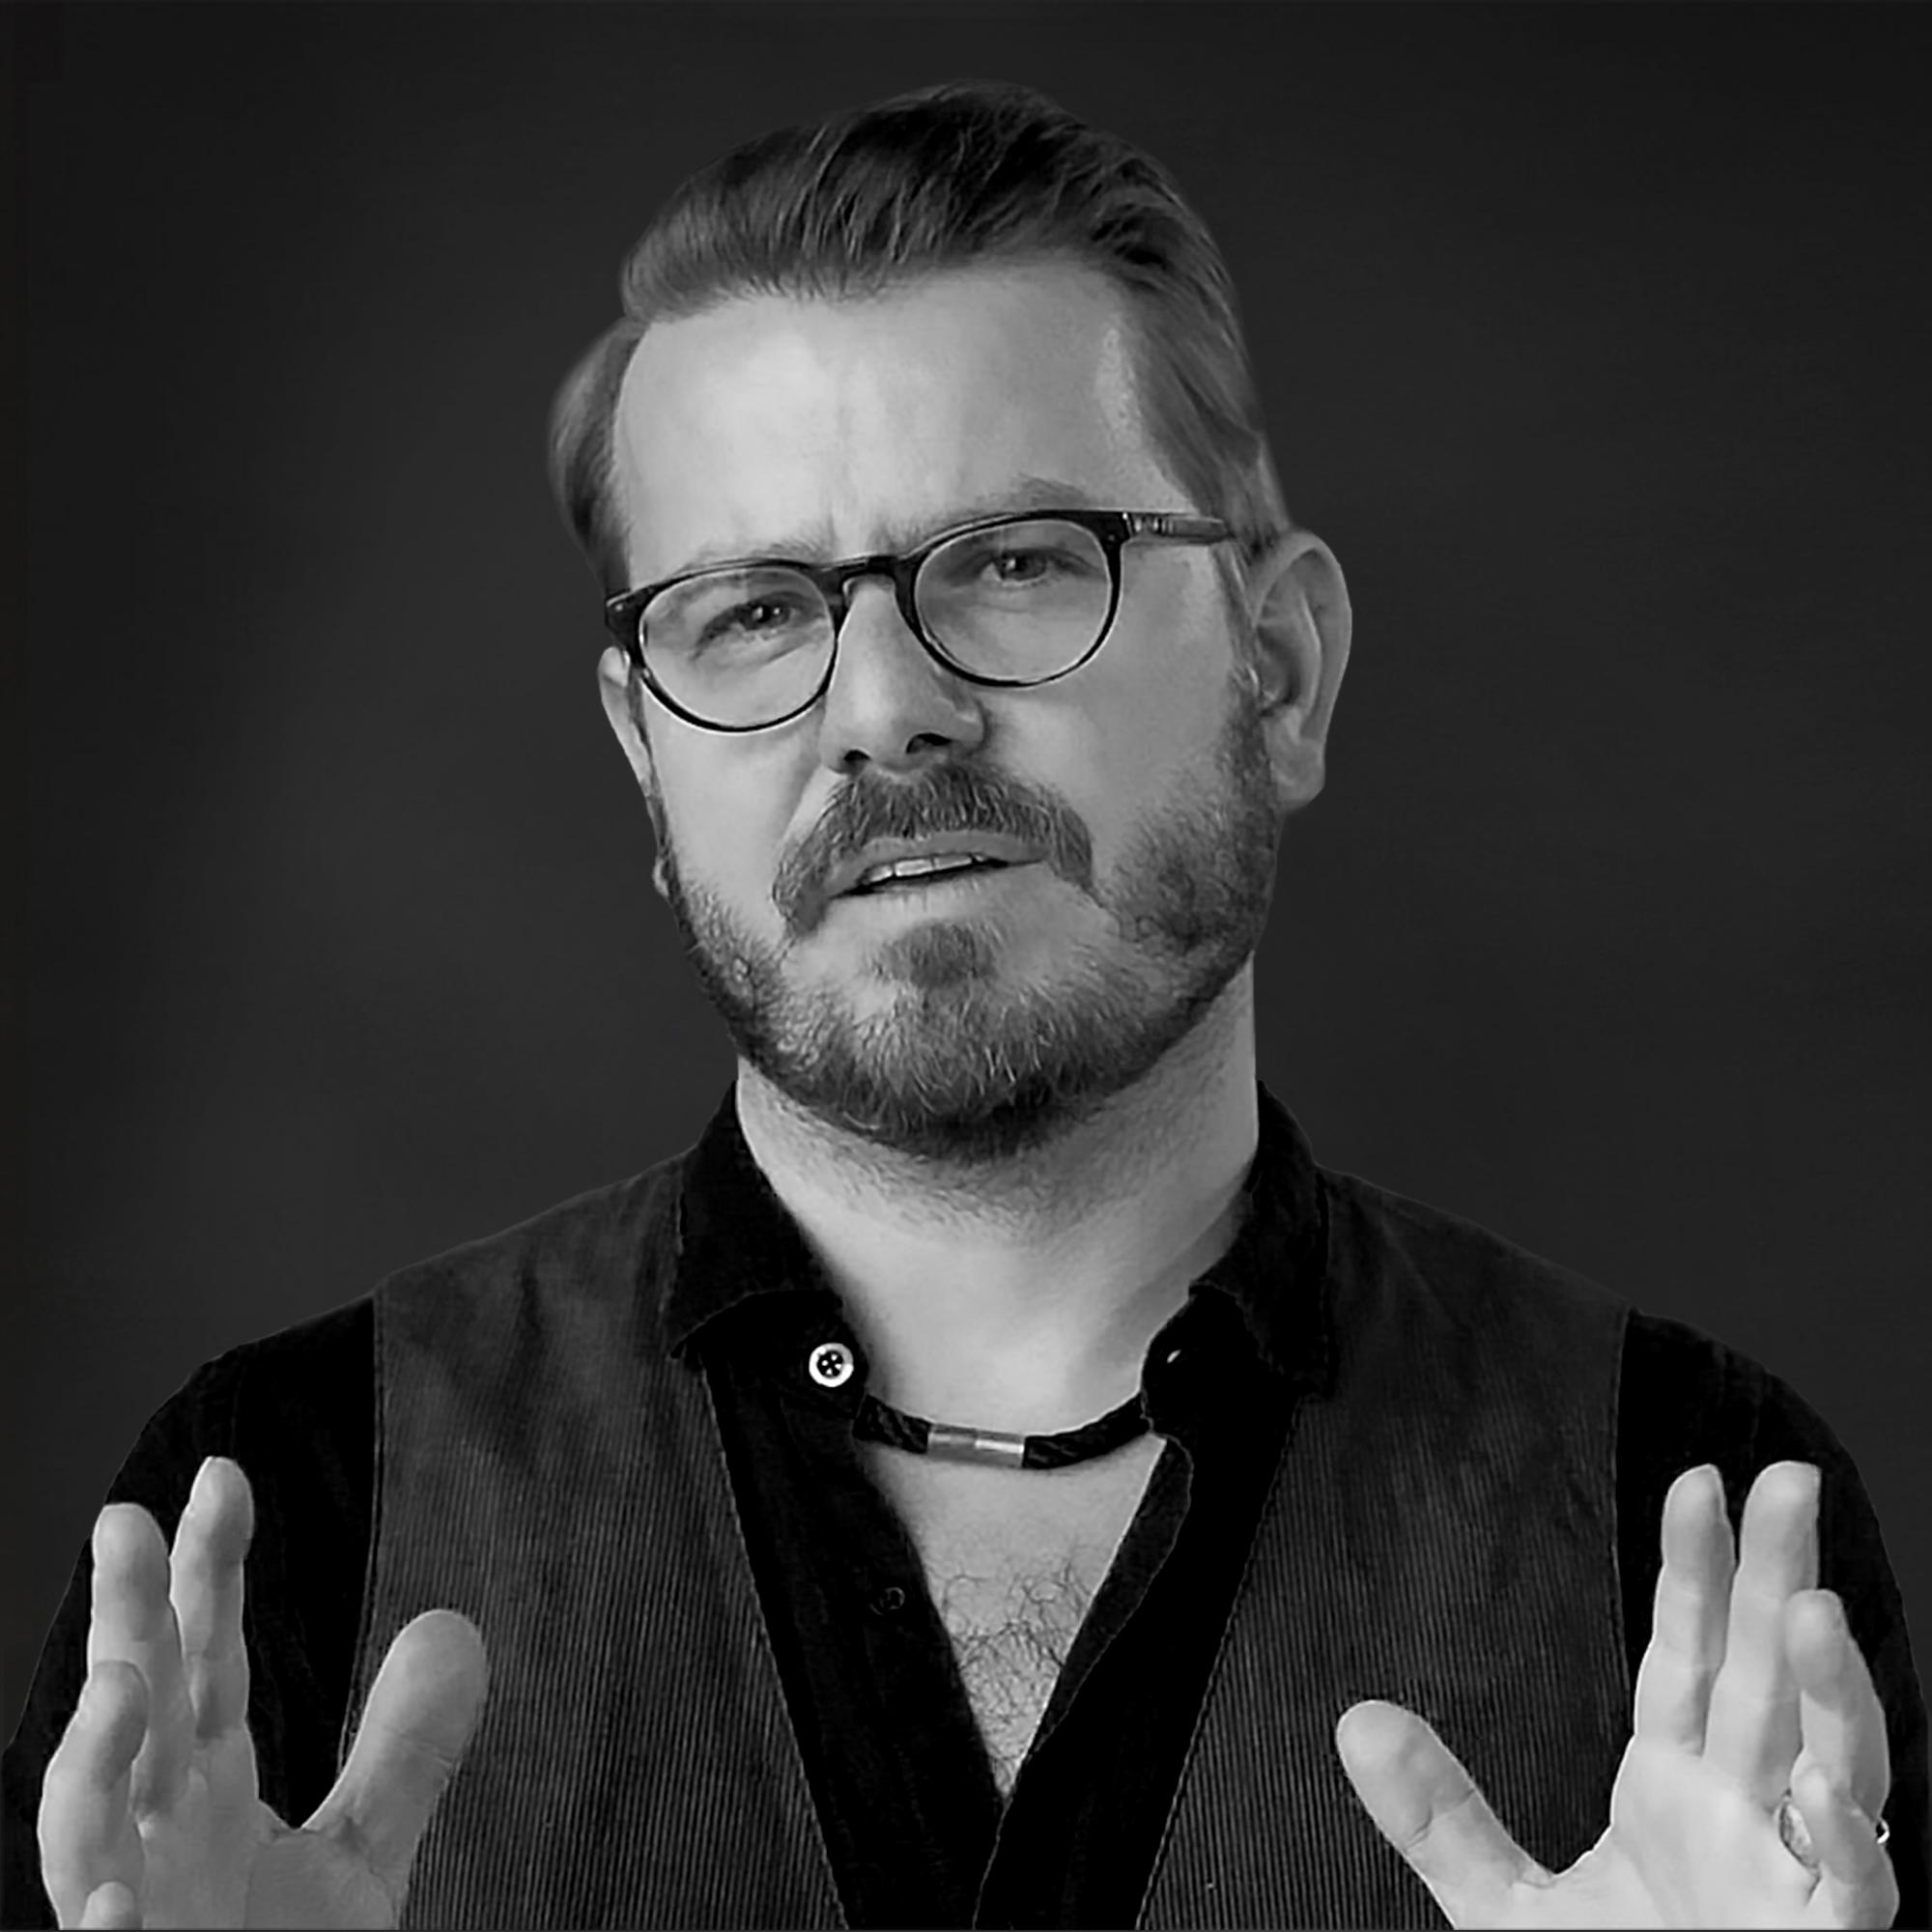 2019_Florian-Wieser_beyondtalks-II_Martin-et-Karczinski@2x